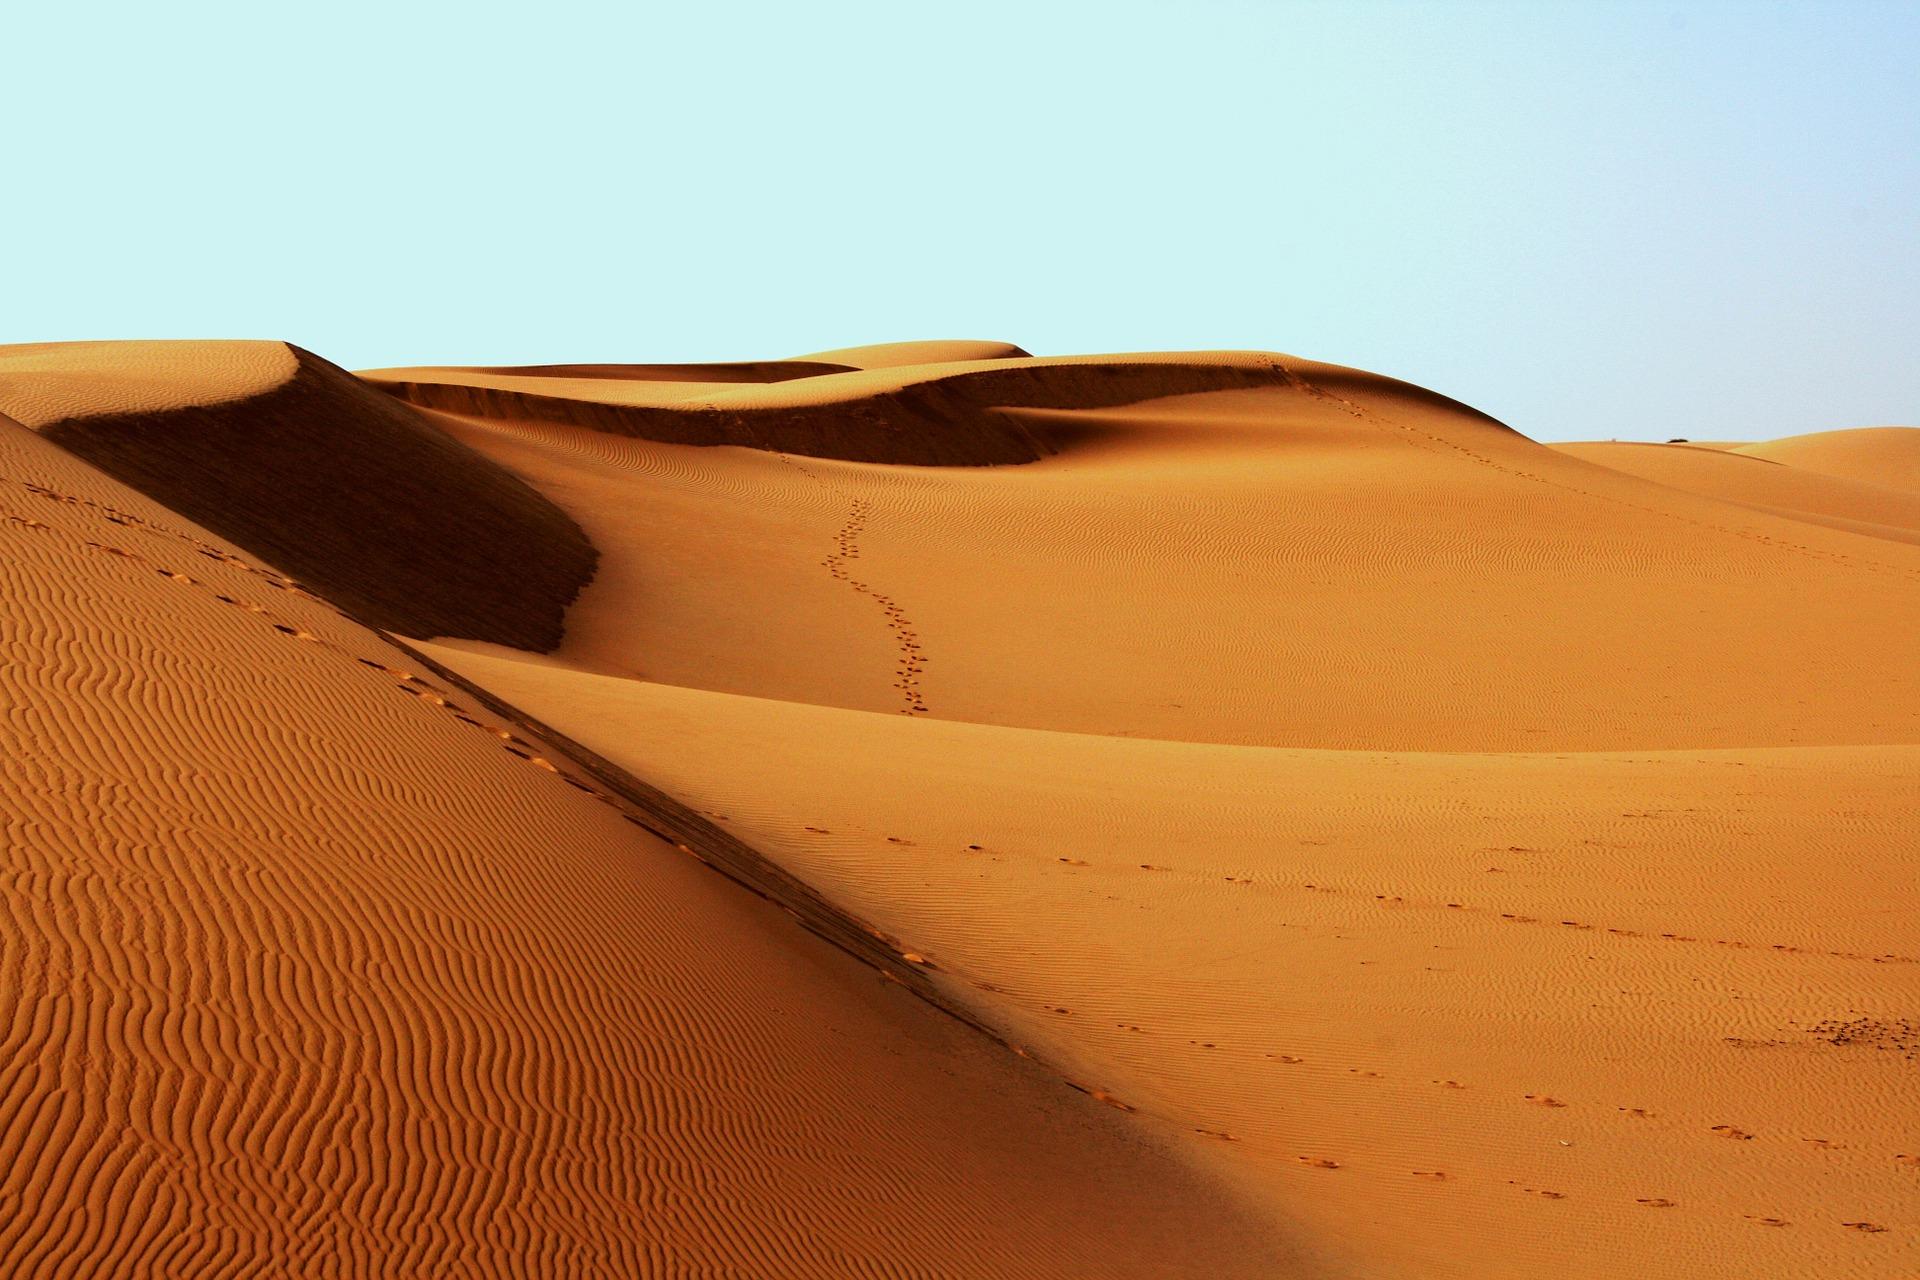 British Academy Seeks Participation in Virtual Sandpits 2021